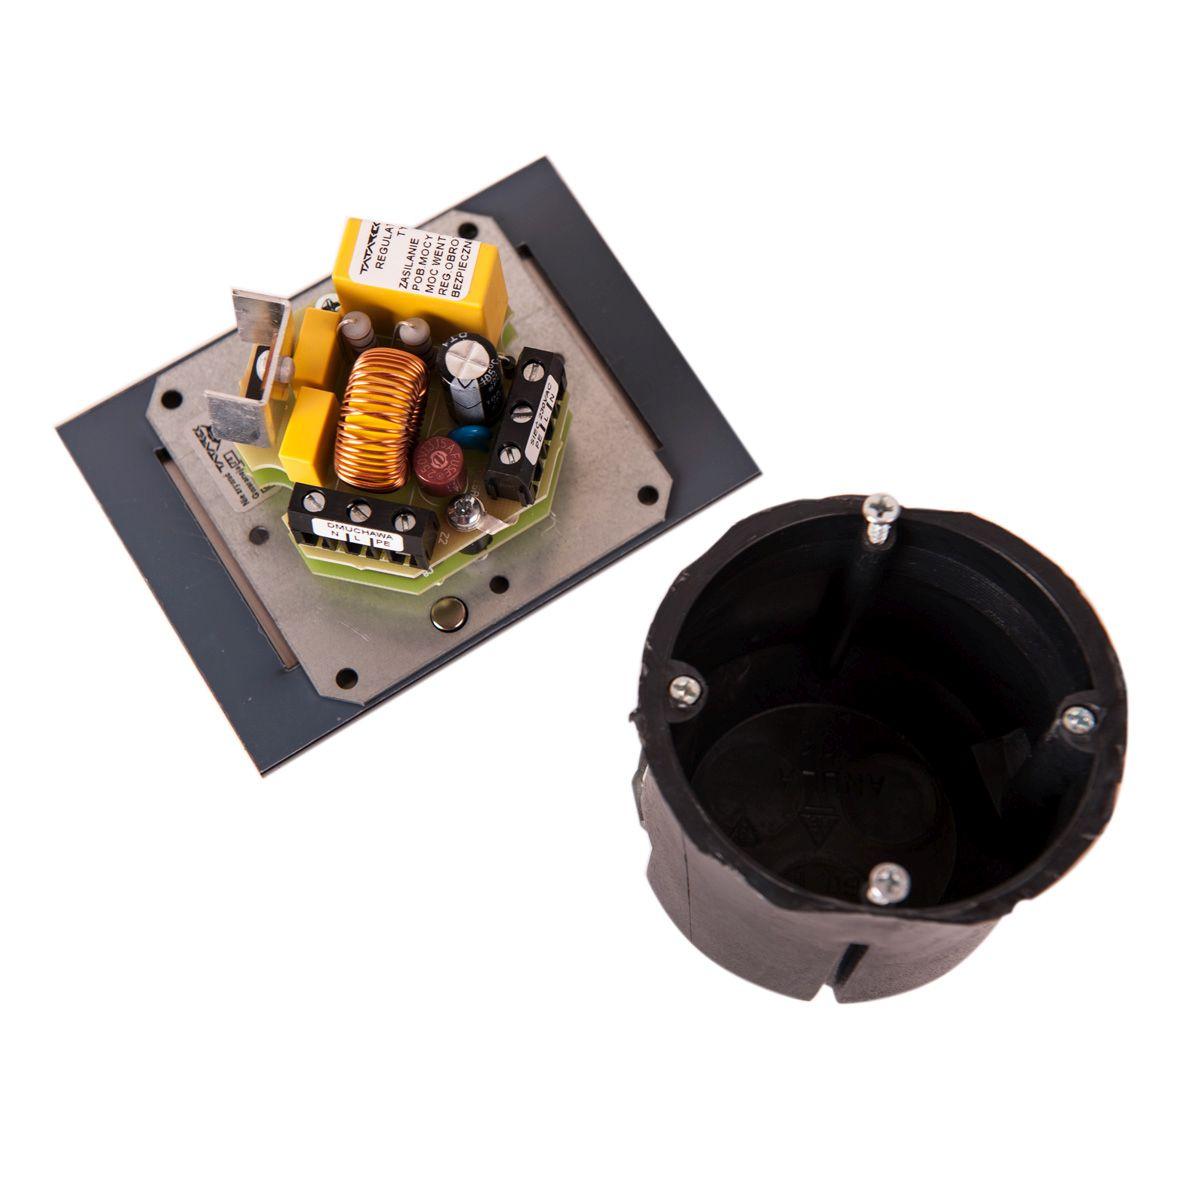 Regulátor otáček ventilátoru RT-10 titanium (do zdi)